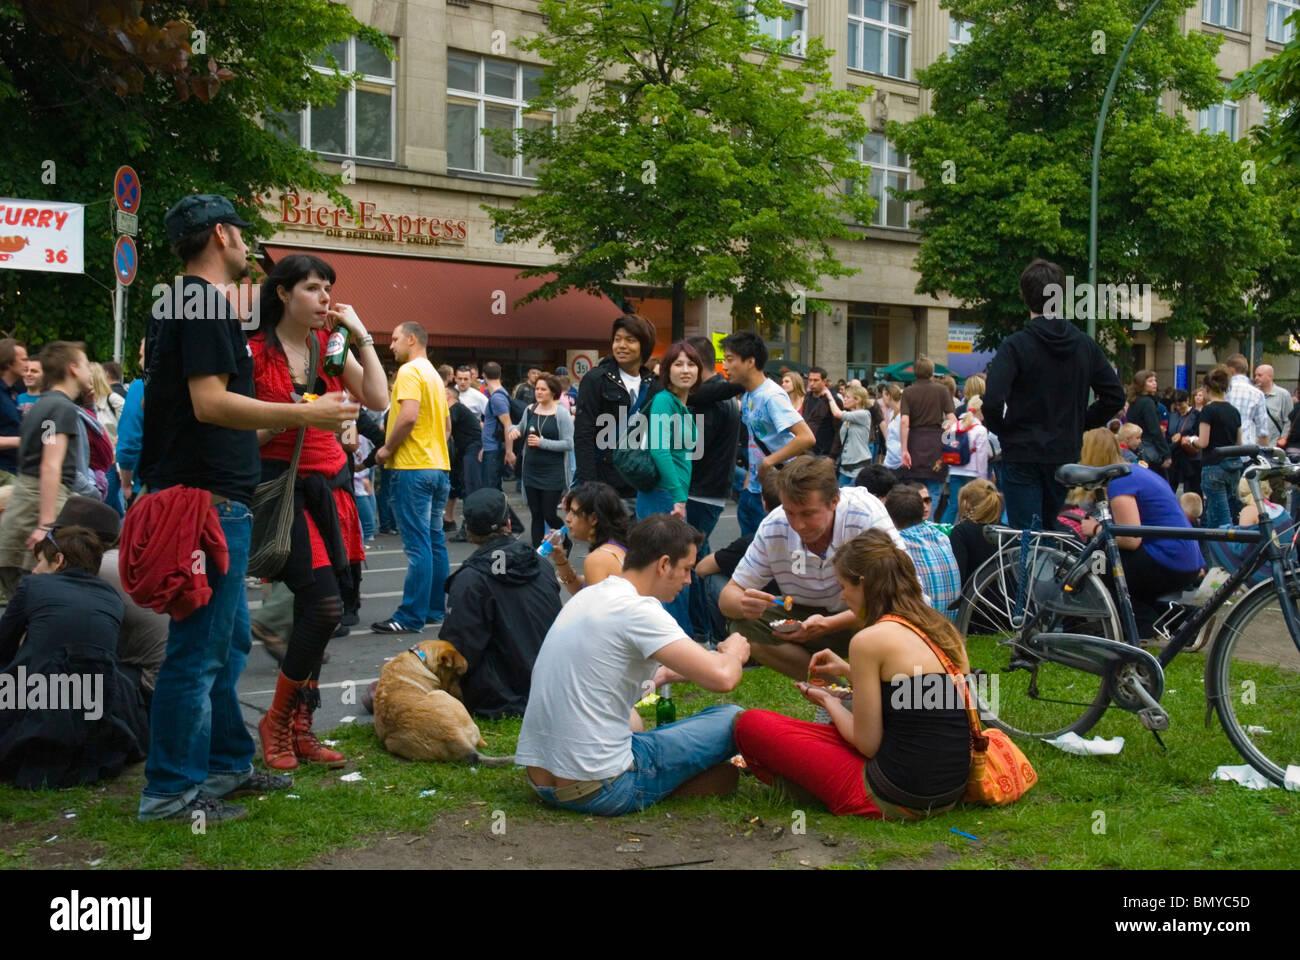 Karneval der Kulturen (il Carnevale delle culture) street festival kreuzberg Berlino Germania Eurore Immagini Stock